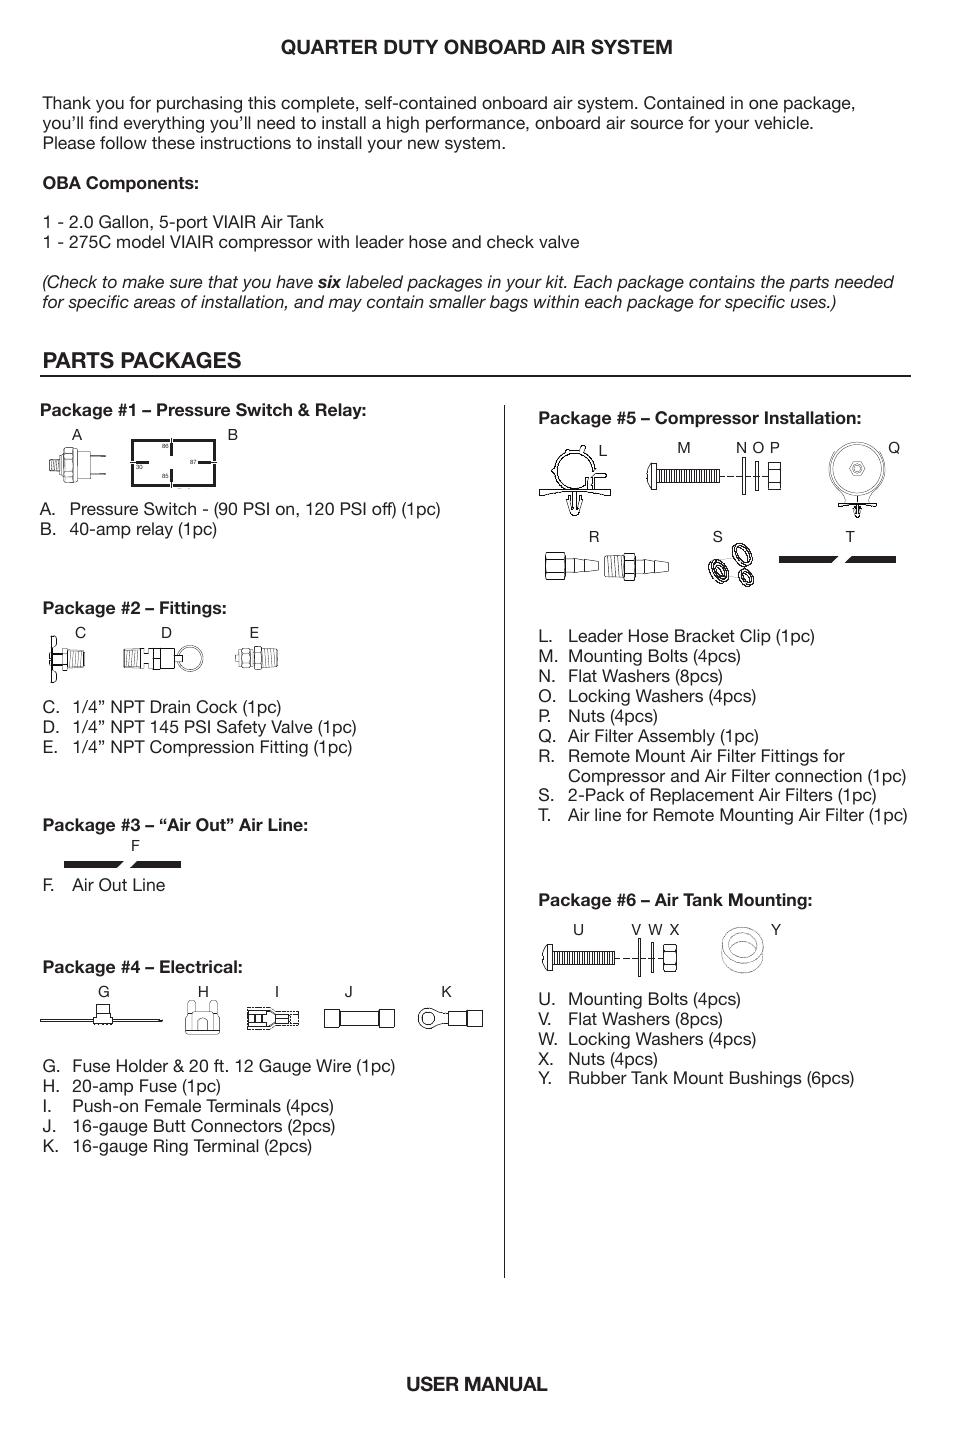 Perfect Gauge Wire Amps Gift - Wiring Diagram Ideas - blogitia.com